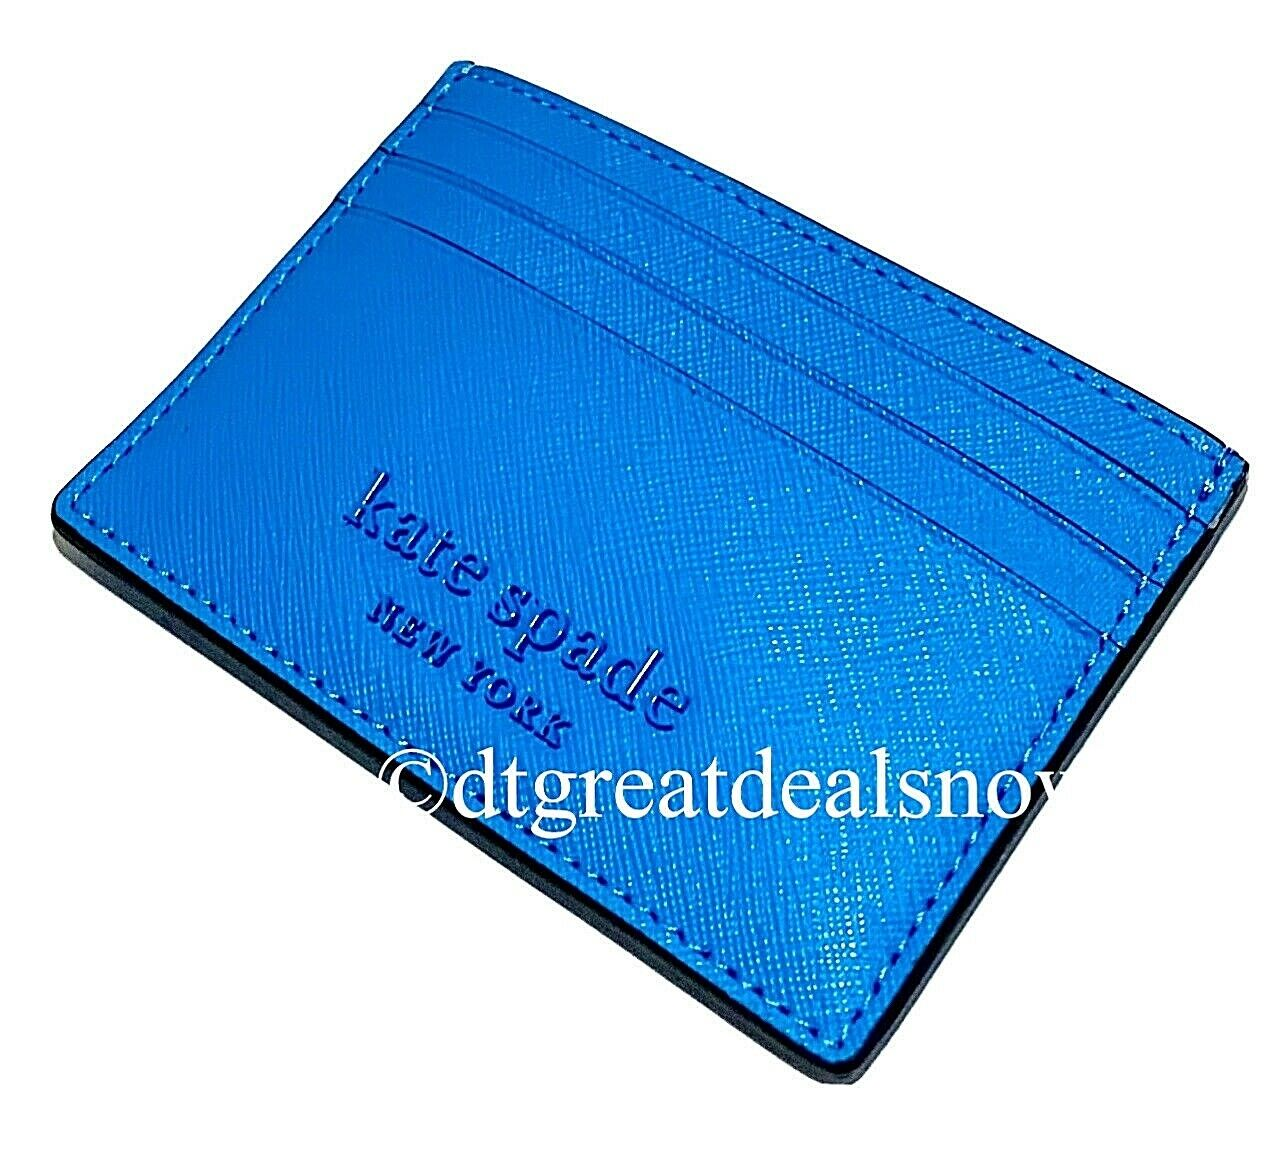 NWT Kate Spade Small Slim Card Holder Cameron Monotone Wallet Oceanside (Blue)